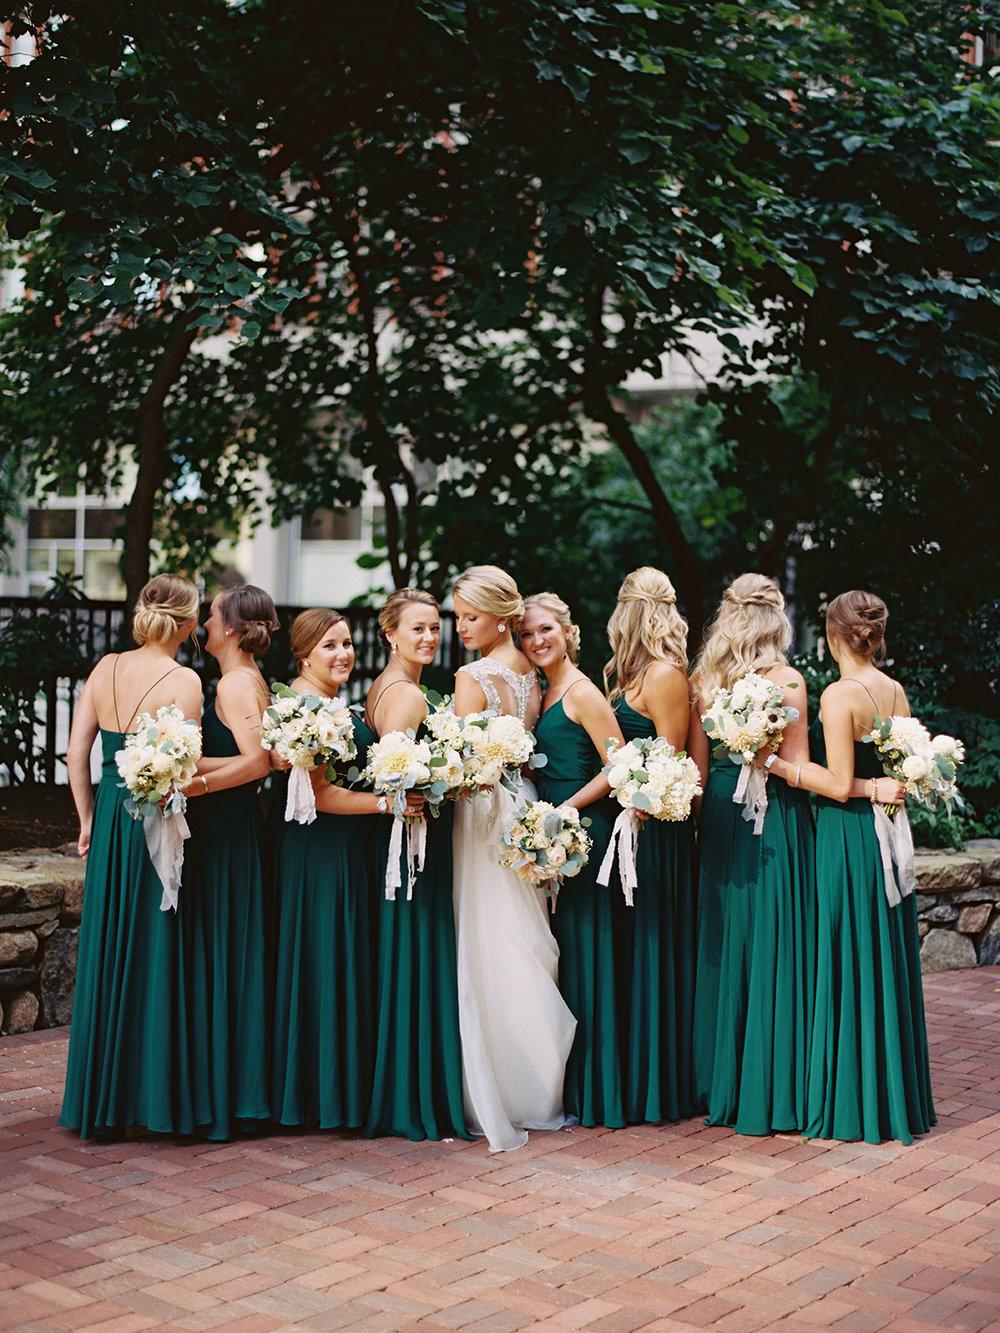 219-andrew-megan-boston-public-library-wedding-film-photographer.jpg